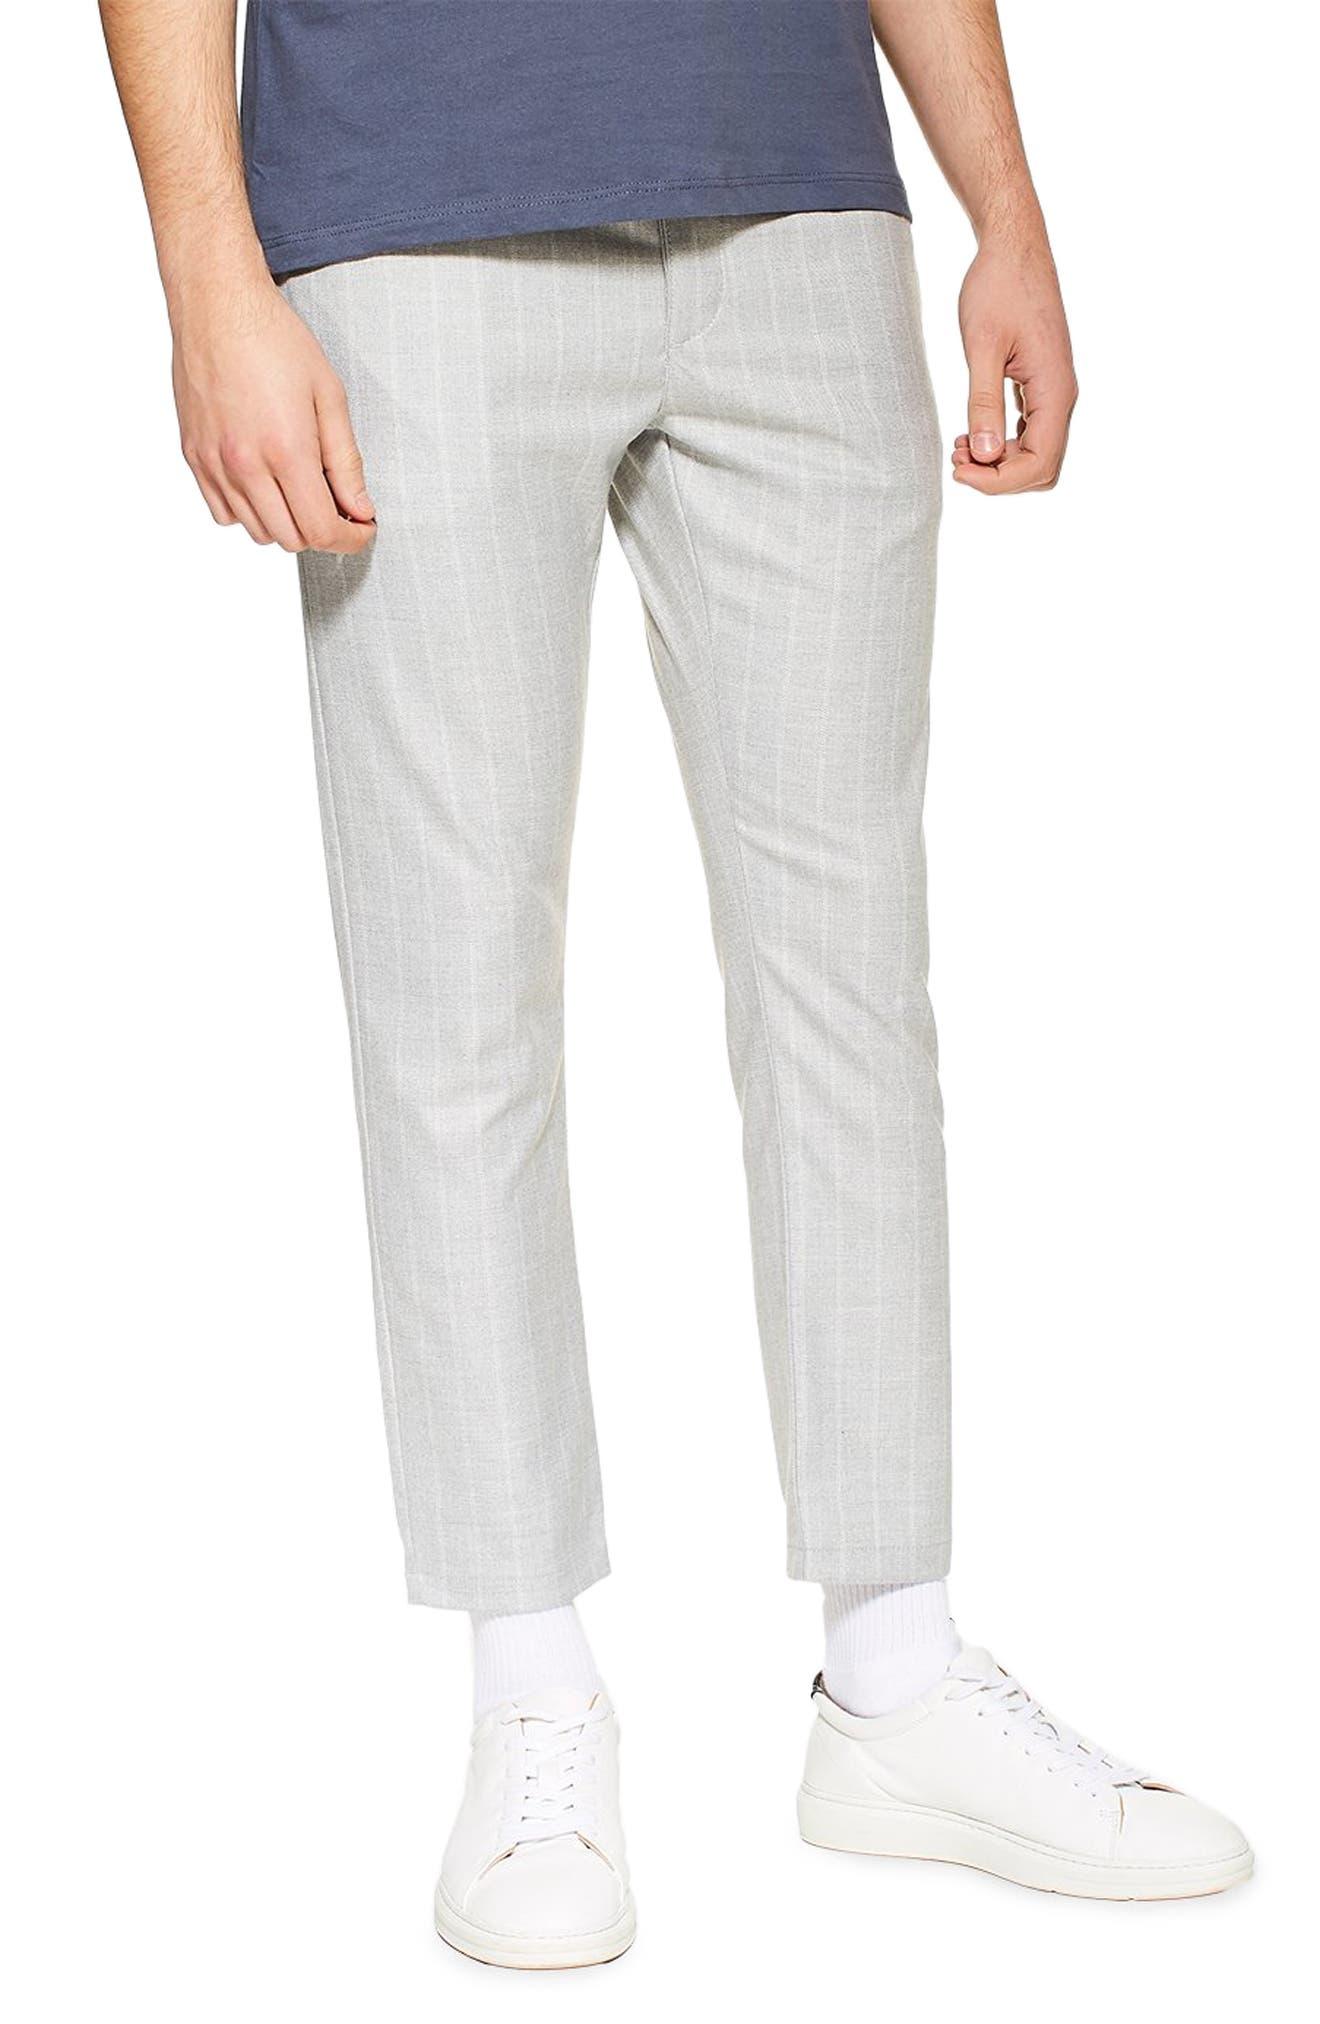 TOPMAN, Skinny Fit Stripe Crop Trousers, Main thumbnail 1, color, GREY